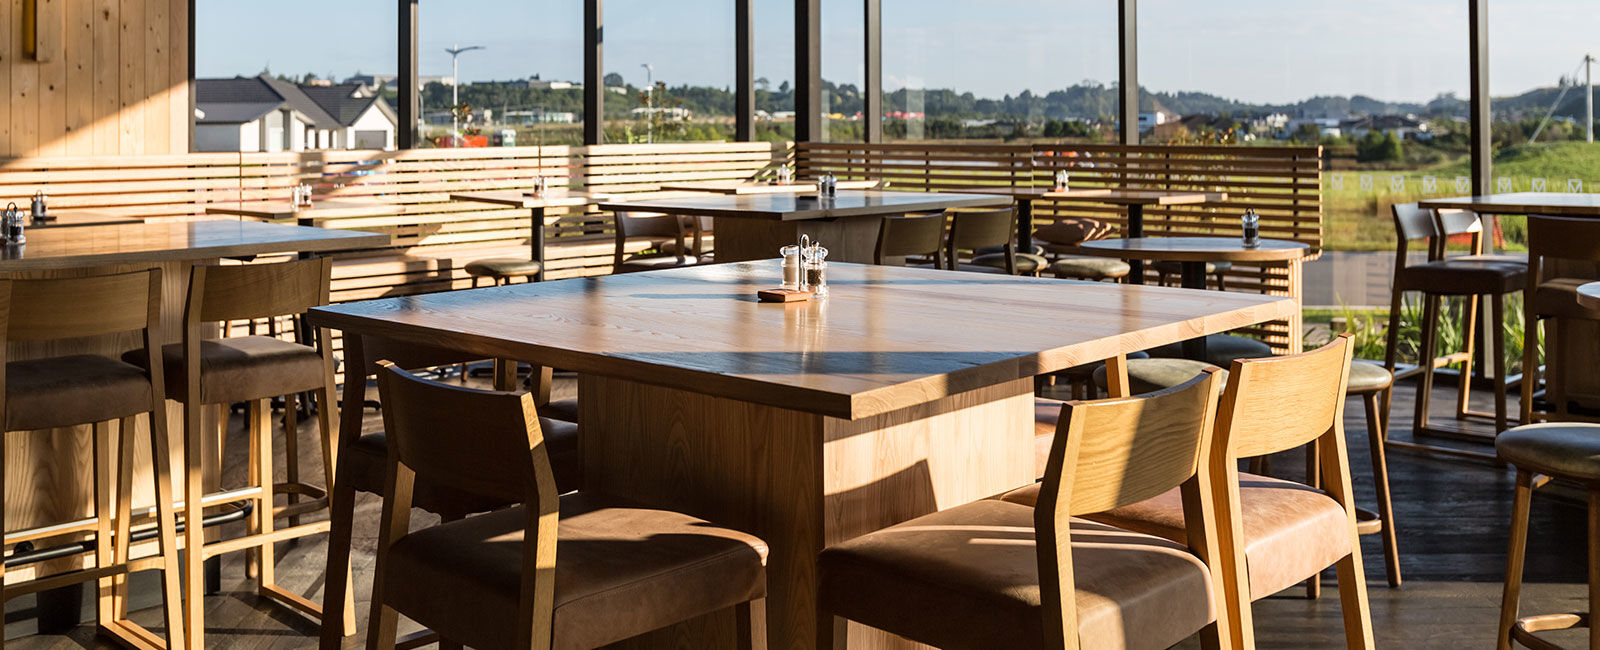 Maude Cafe Restaurant Furniture